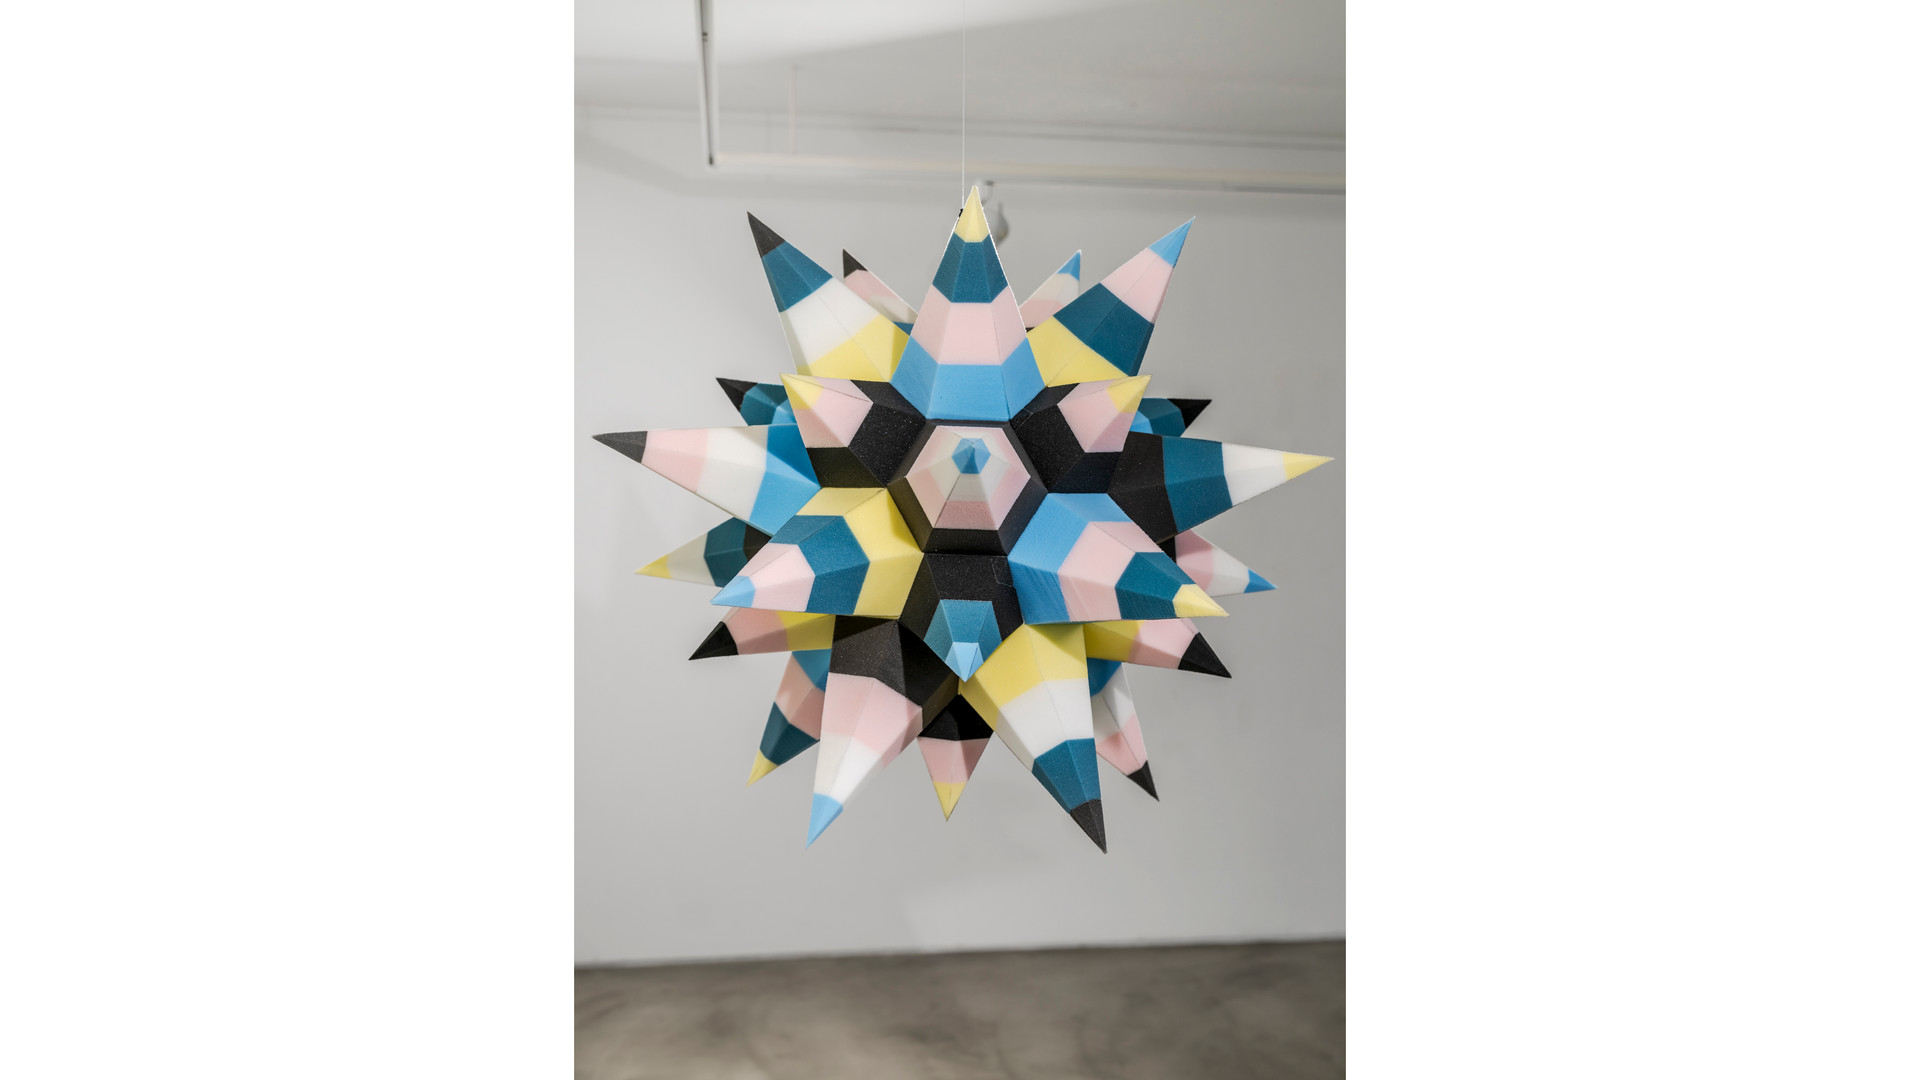 Silent Piñata, 2021, Sponge, Styrofoam, 100 x 100 x 100cm